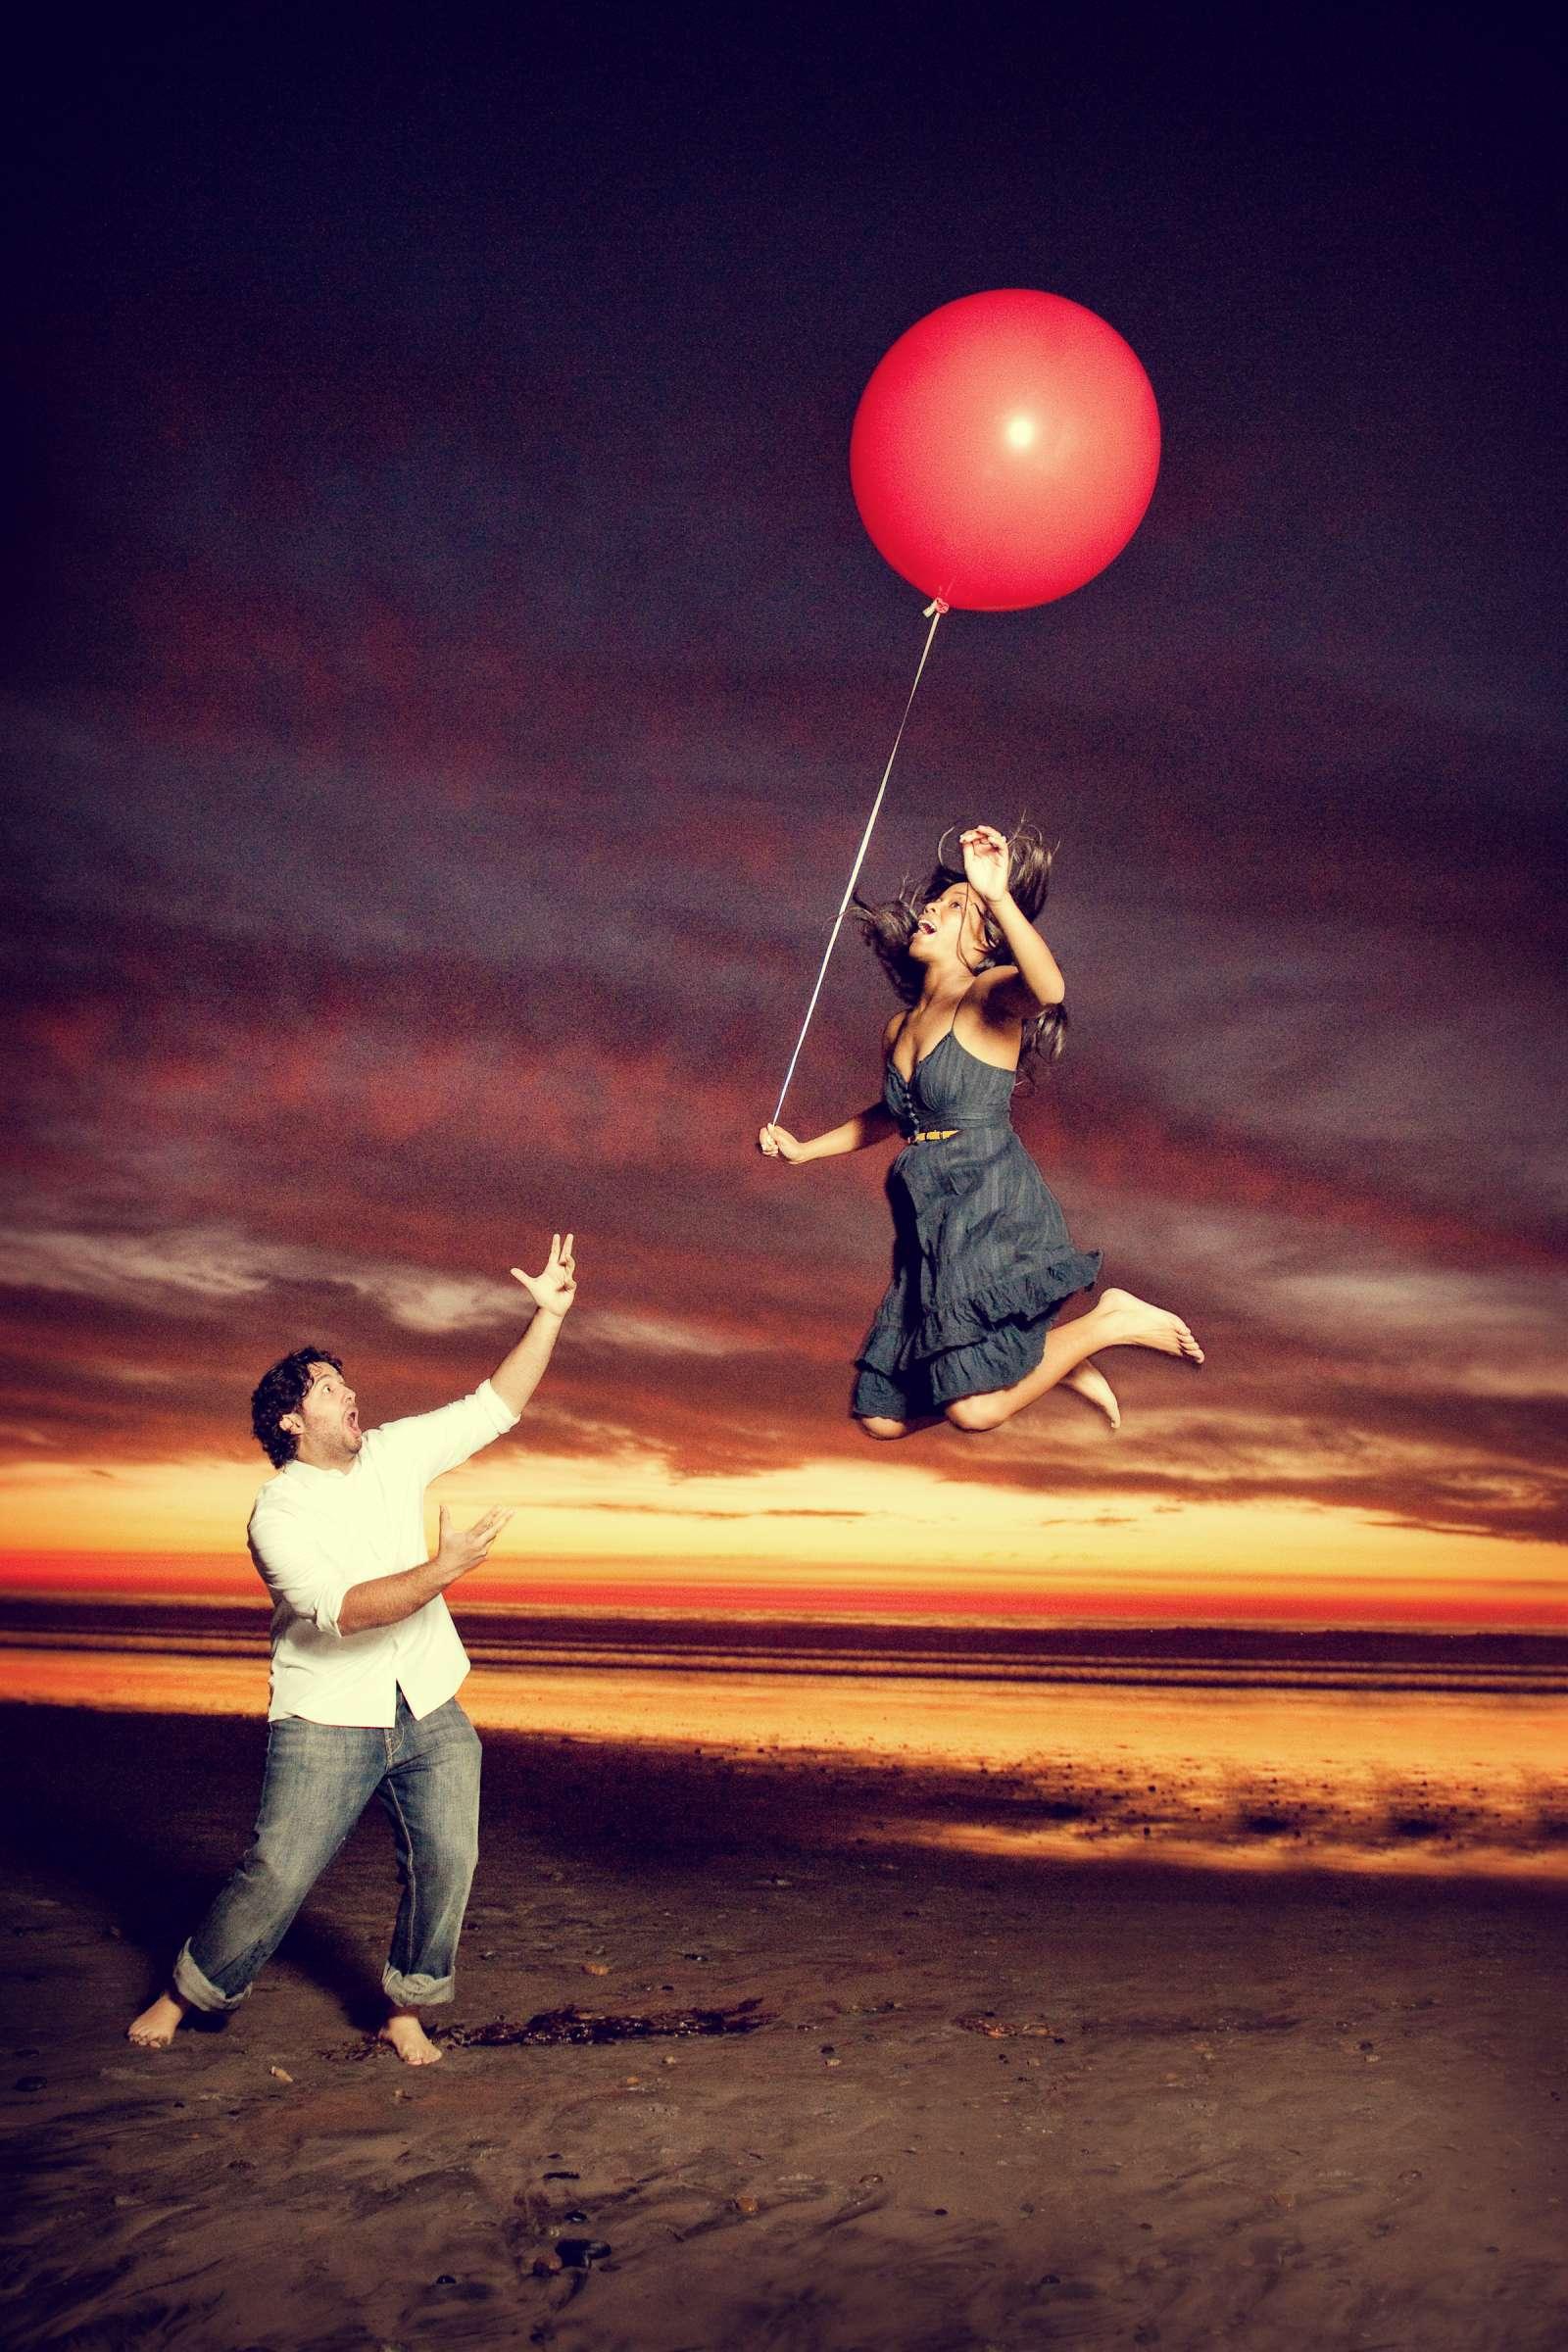 30 Best Wedding Prenup Ideas For A Romantic Photo Shoot